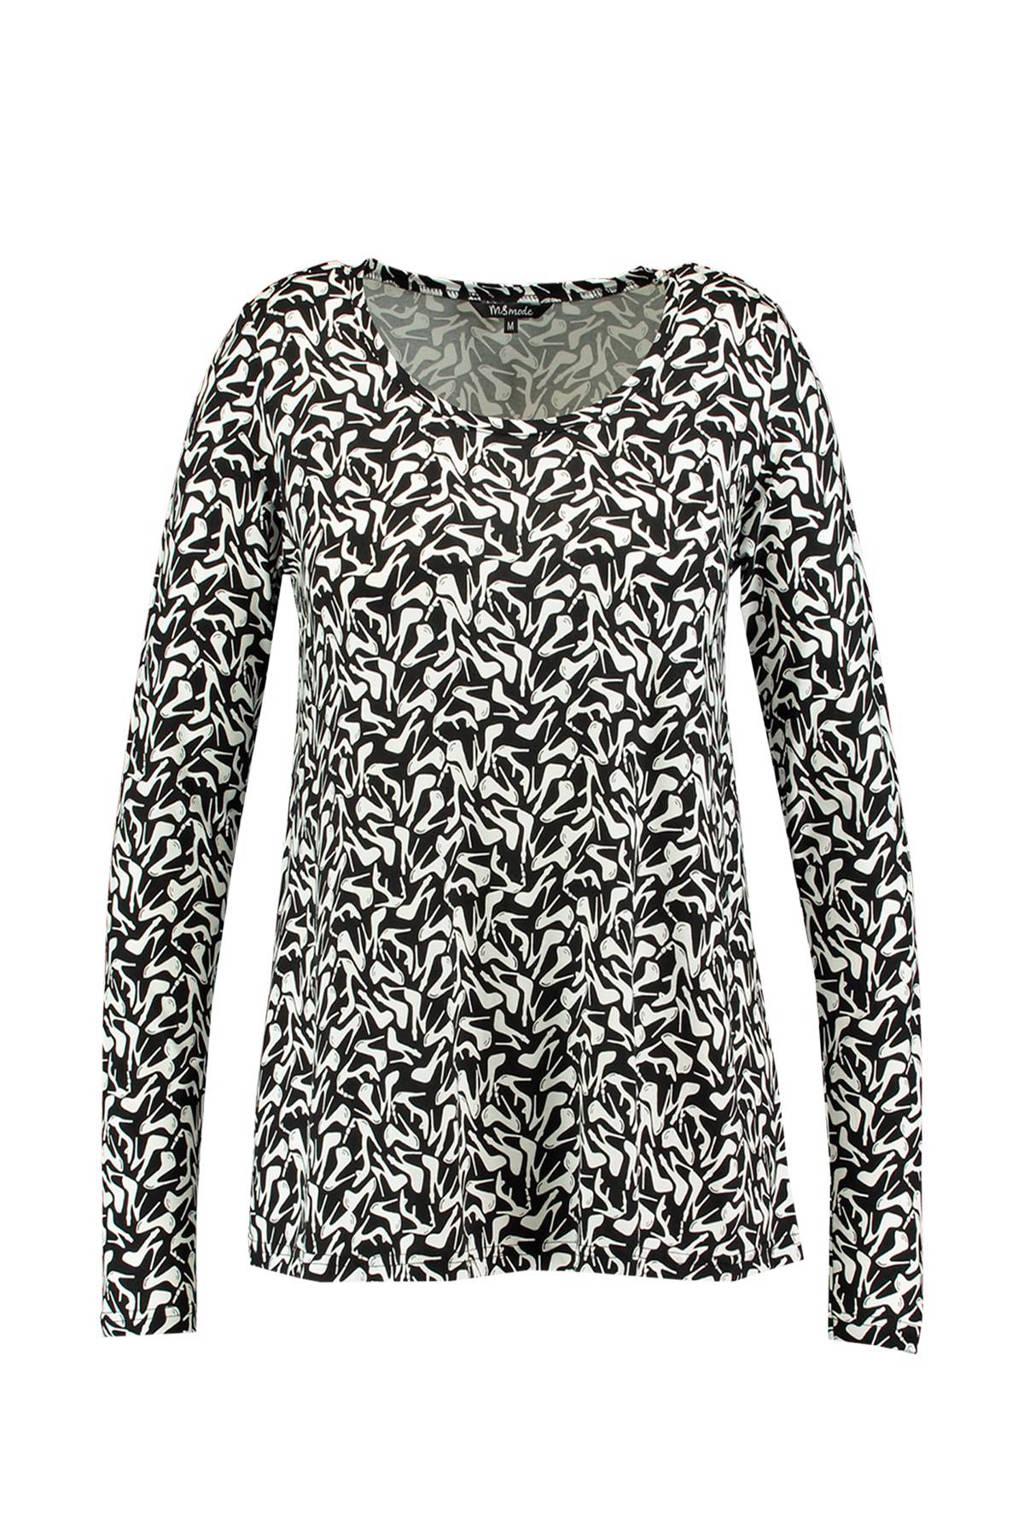 MS Mode top, Zwart/wit